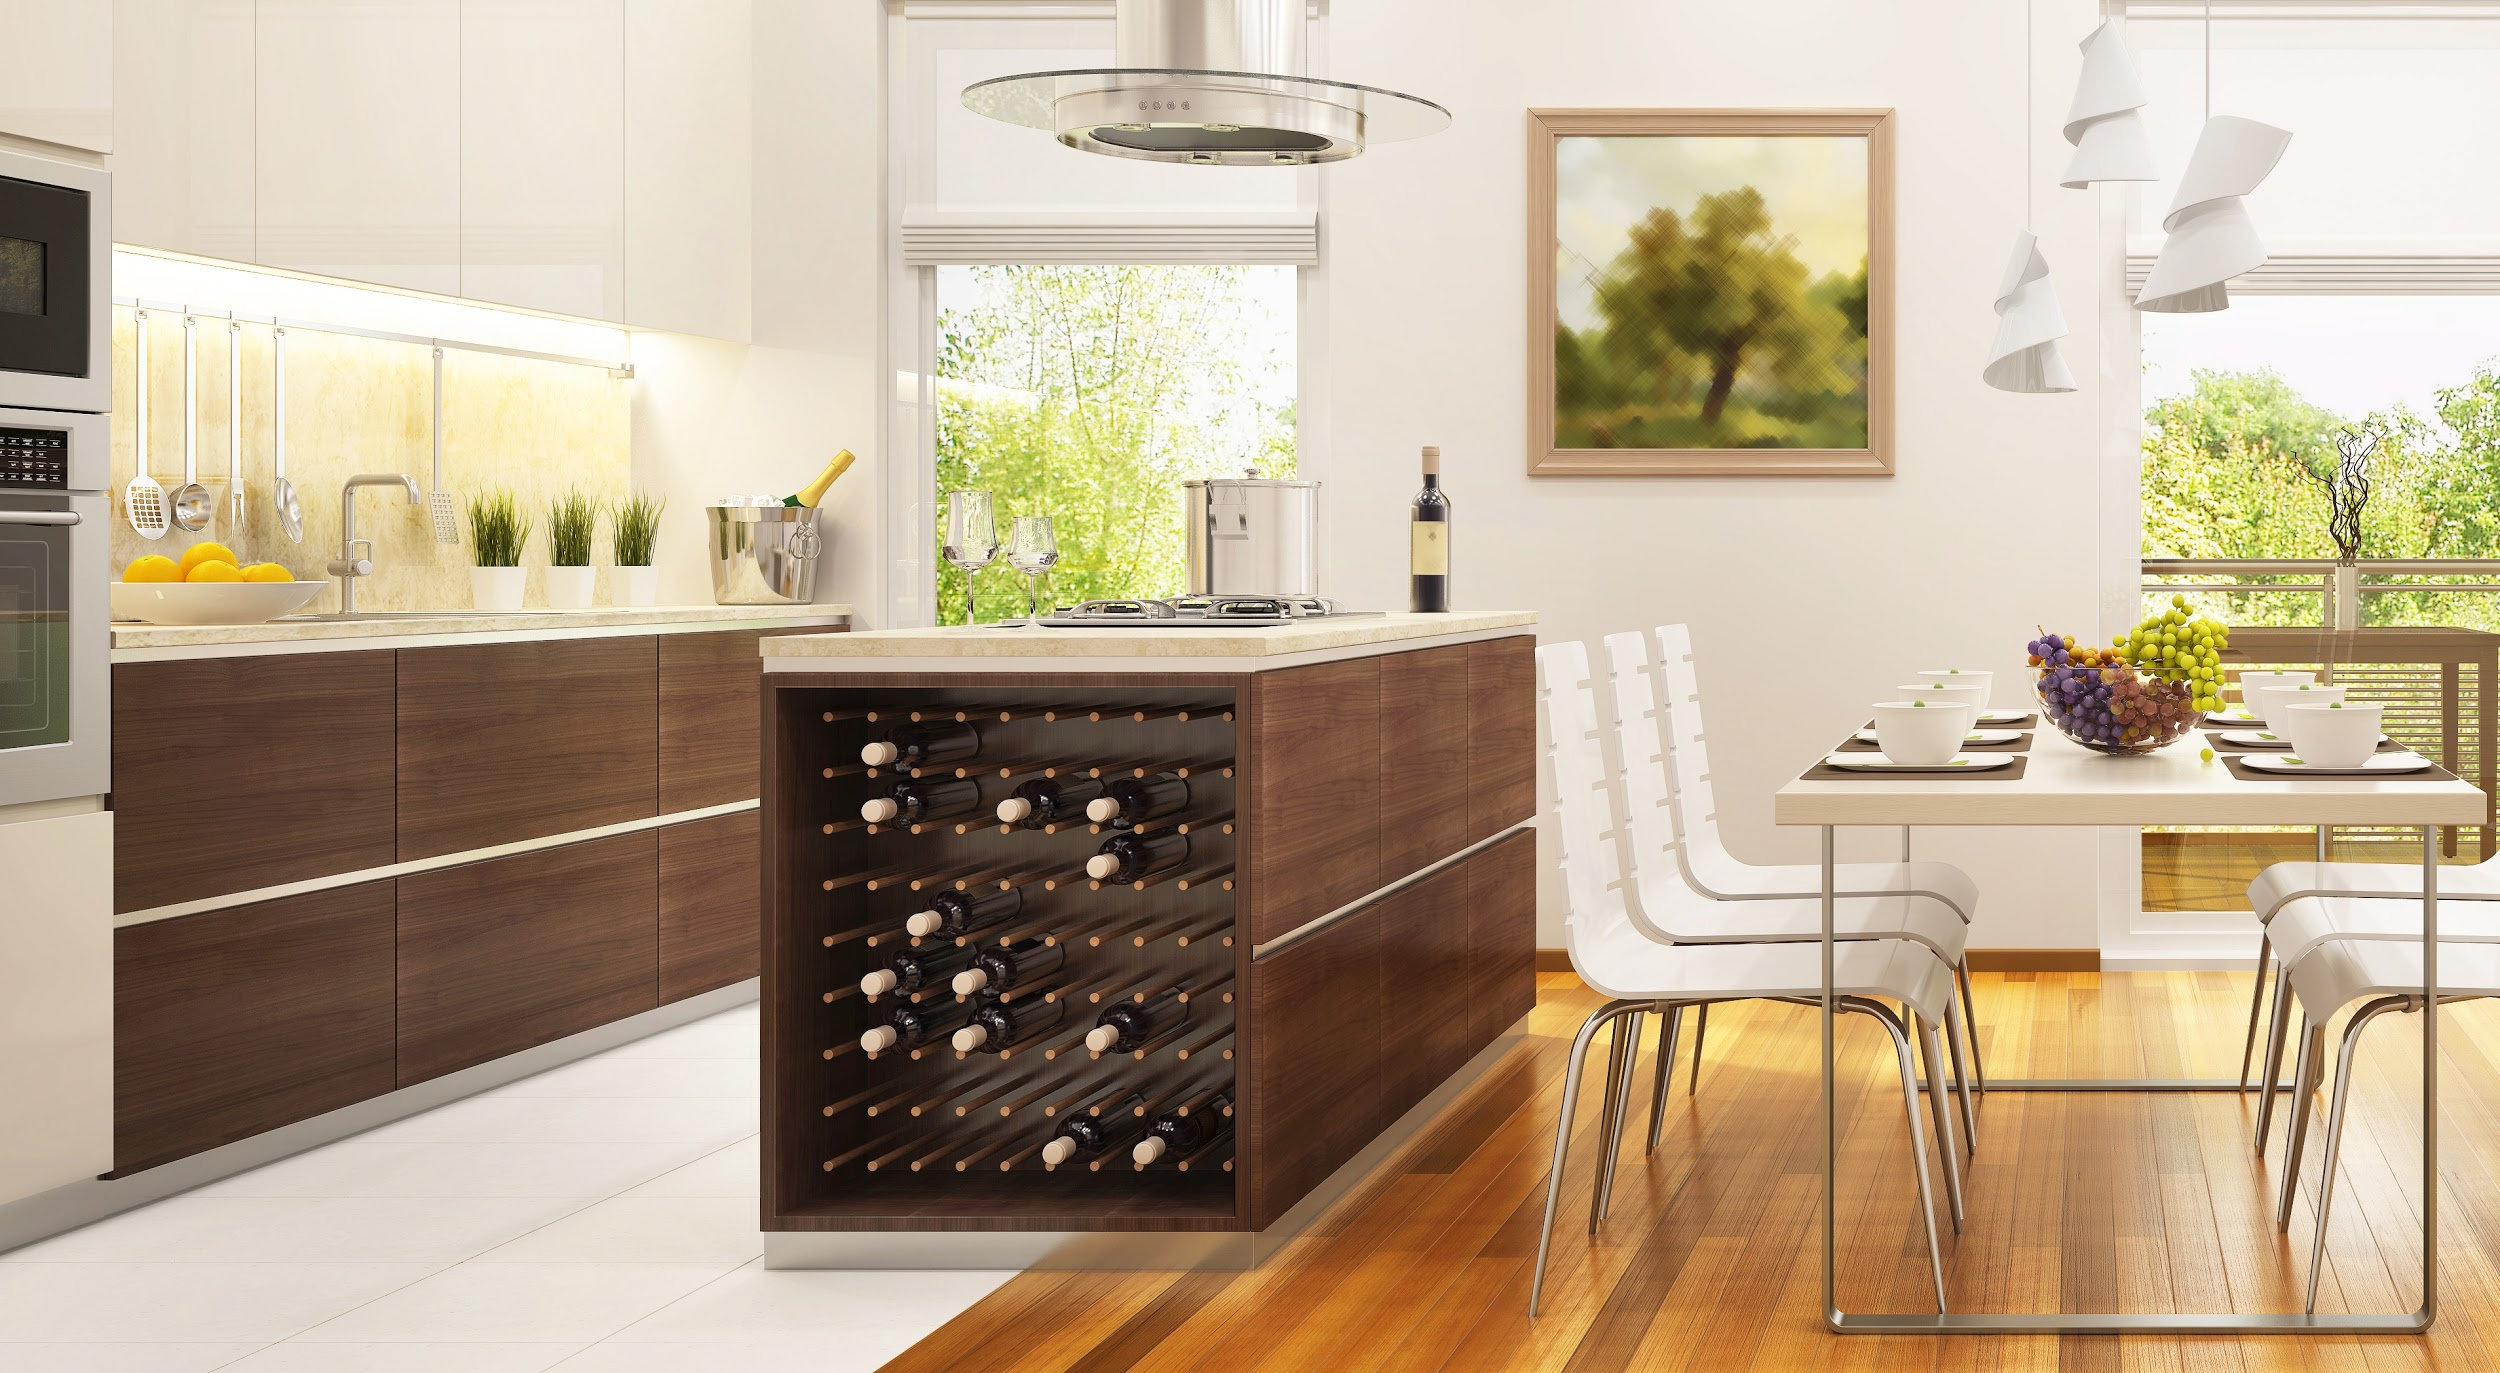 Kitchen Island Wine Rack Article Image